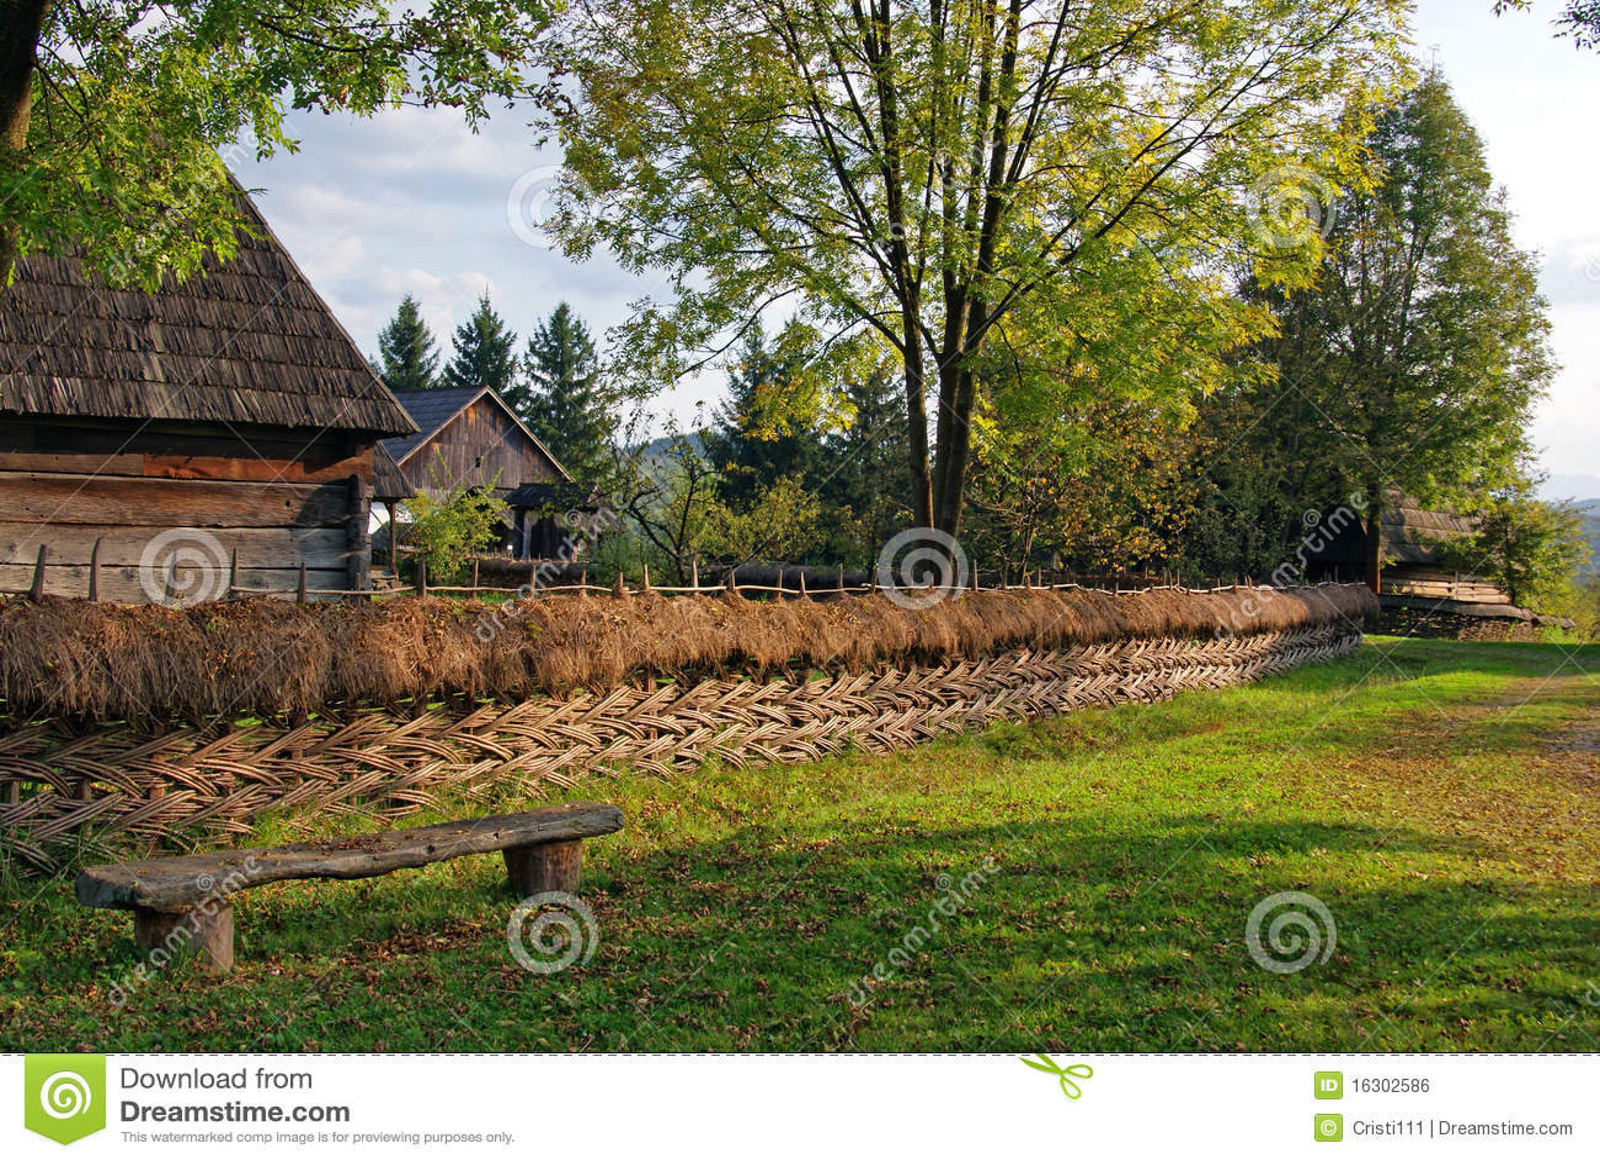 Still Rustic Landscape Royalty Free Stock Image Image